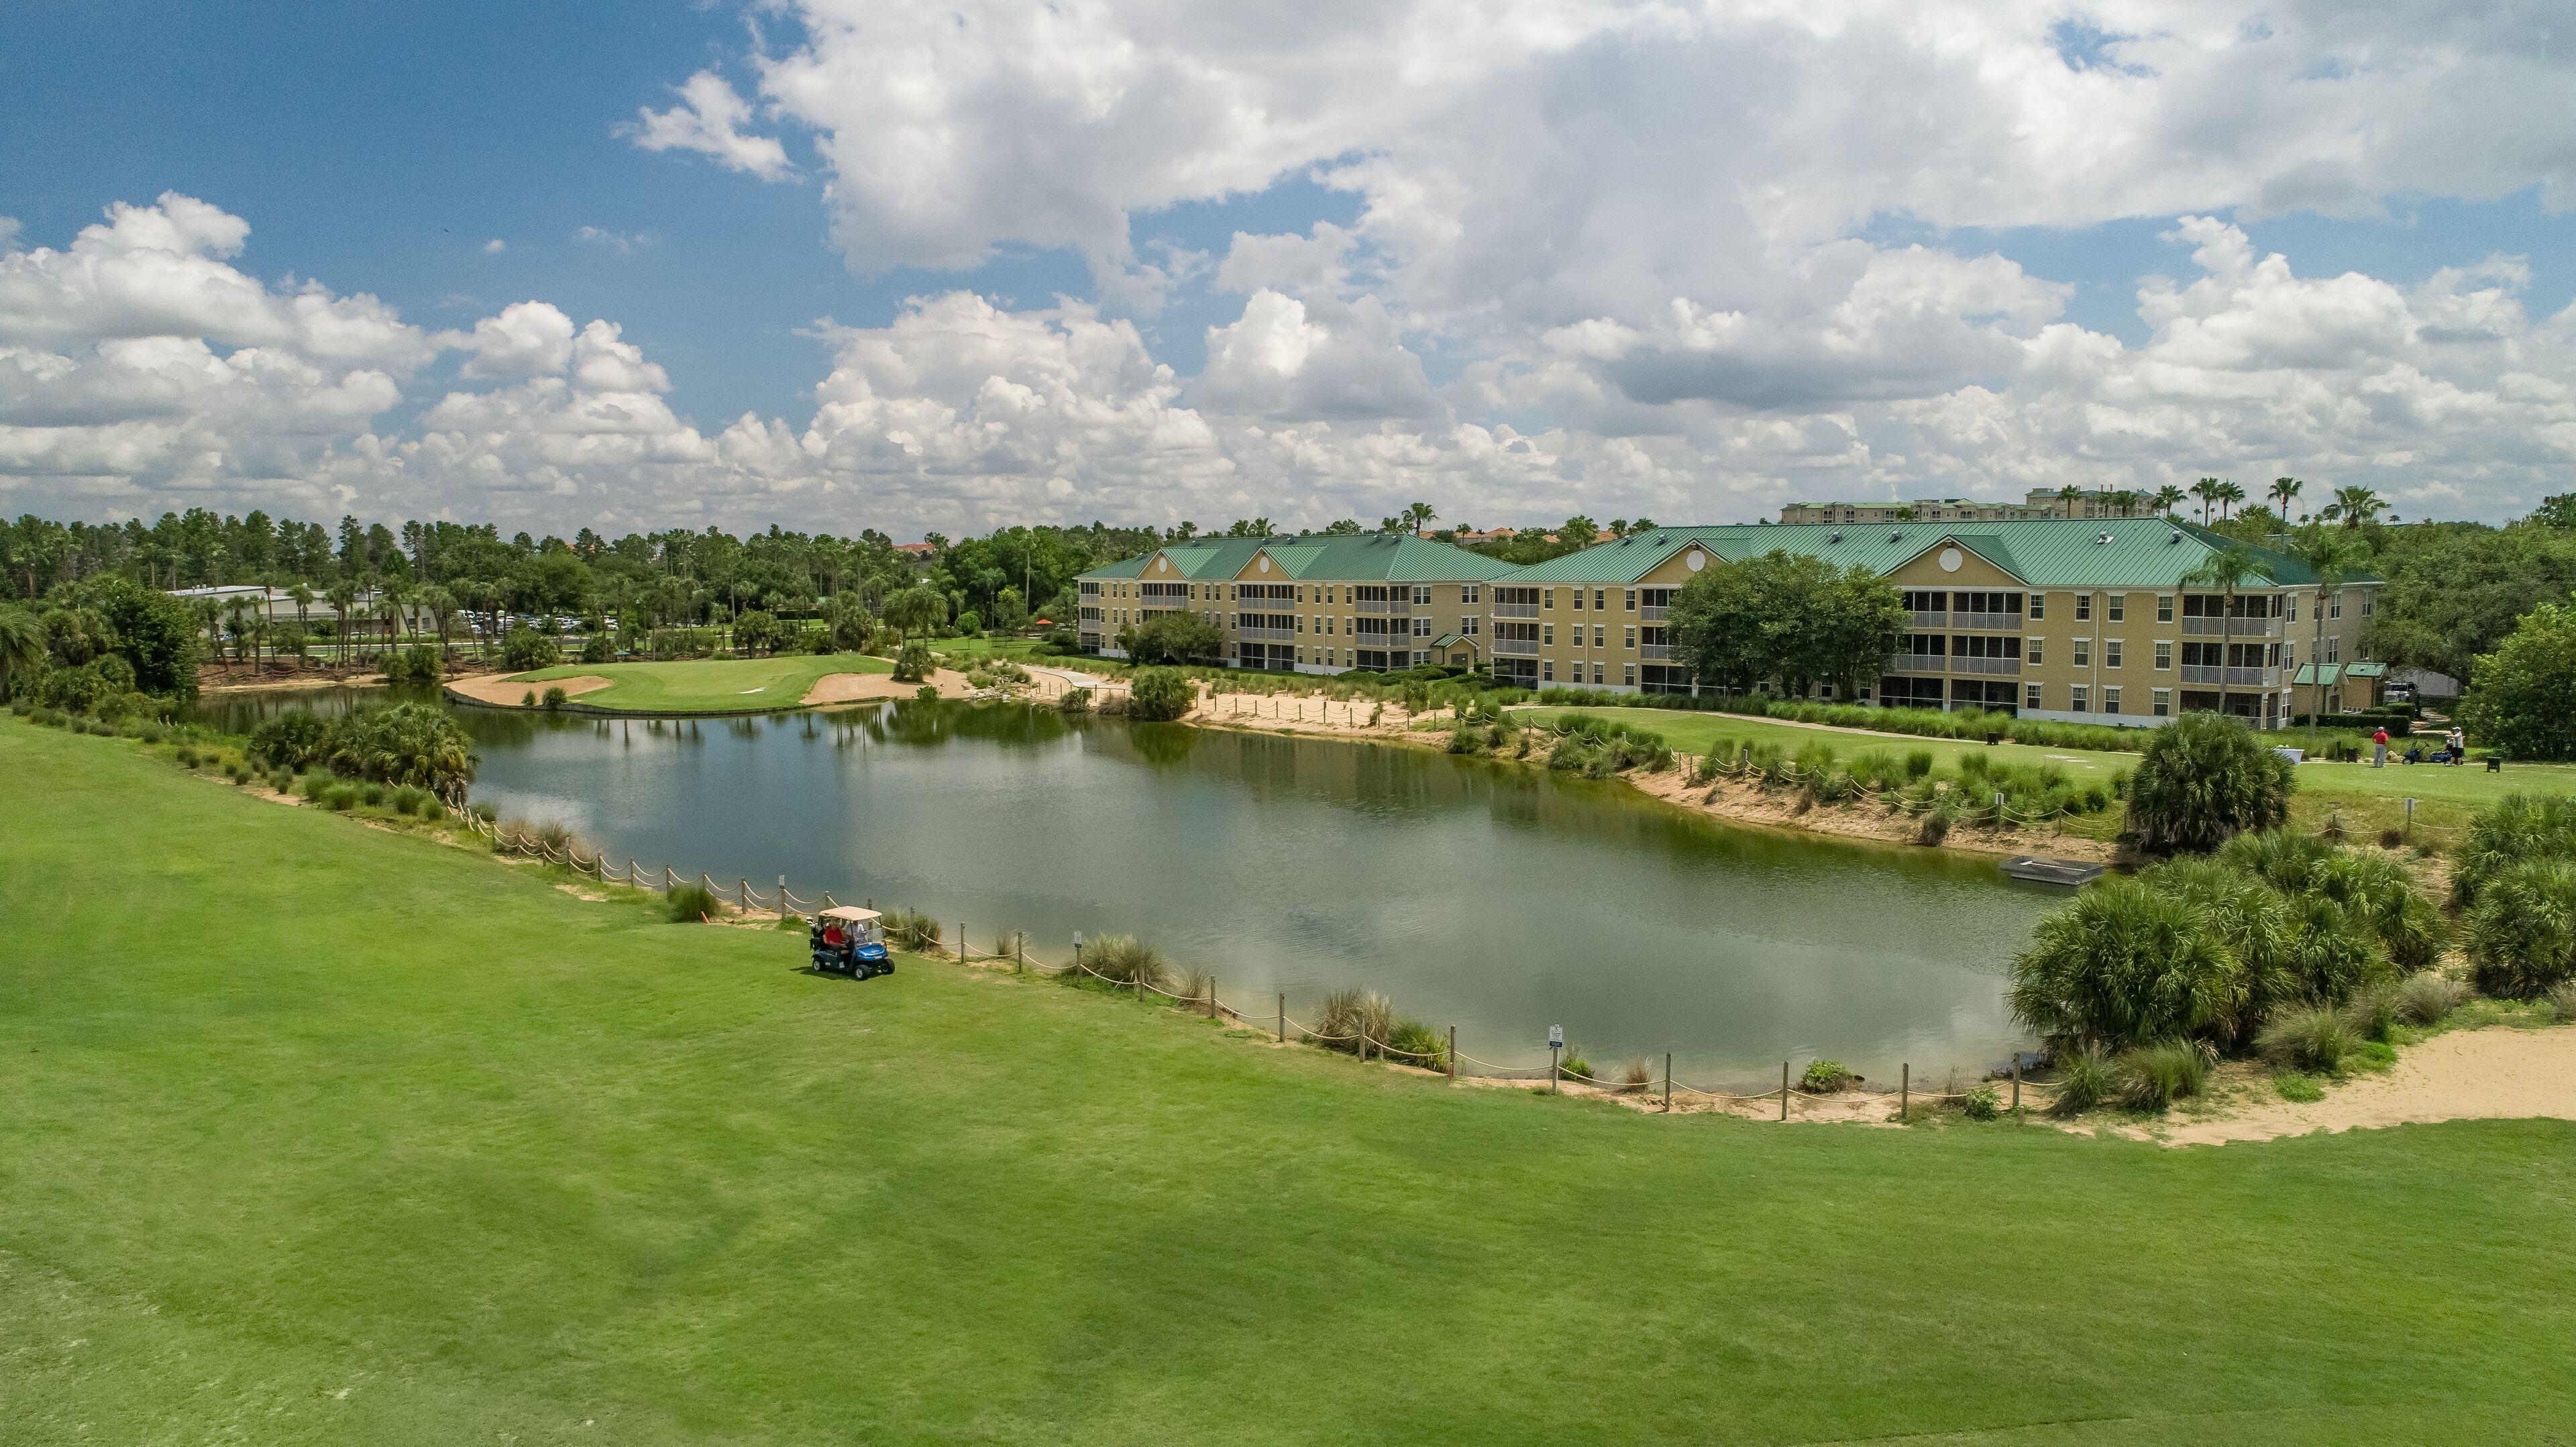 Courtesy of Mystic Dunes Resort & Golf Club by Diamond Resorts / Expedia.com